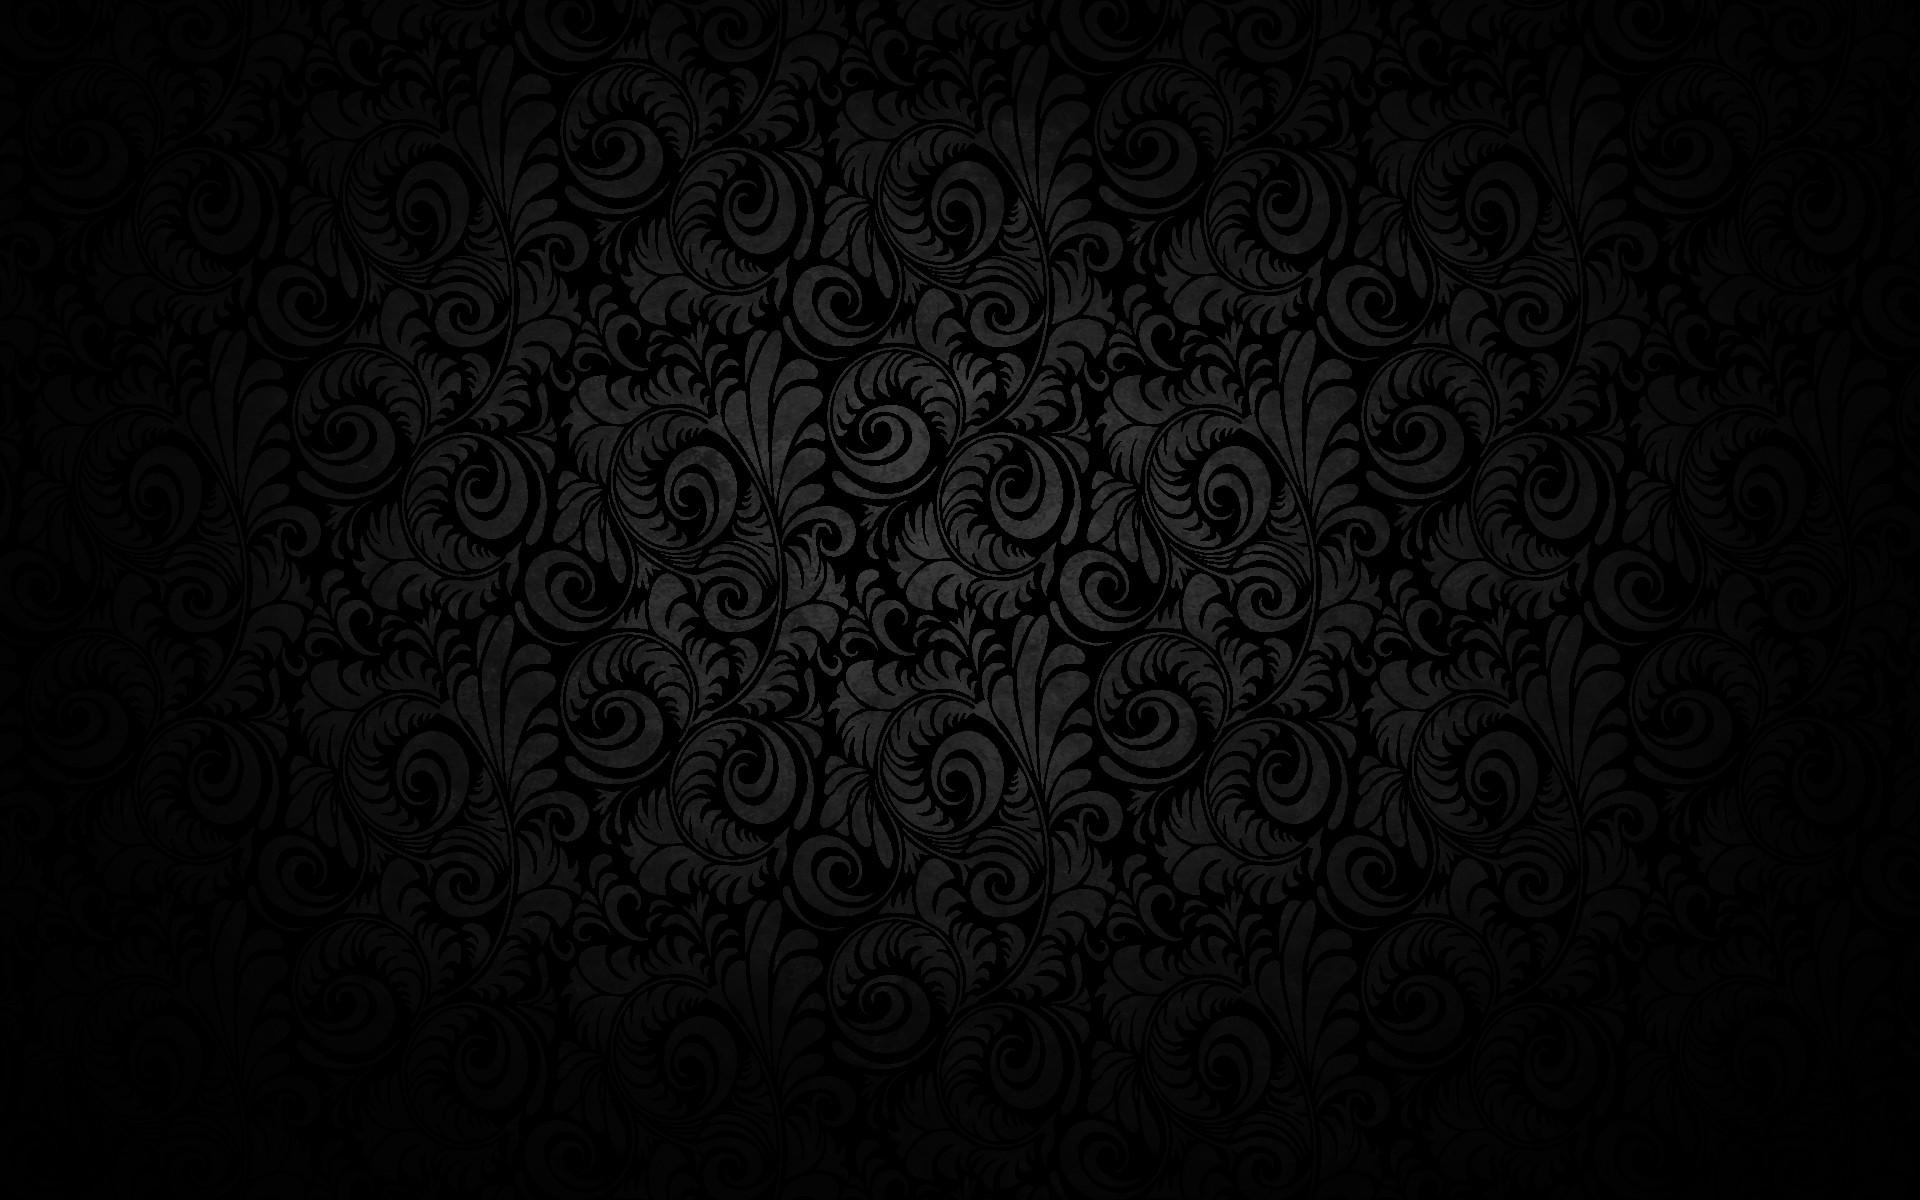 Black Floral Texture Pattern Design Wallpaper #341    hdewallpaper.com